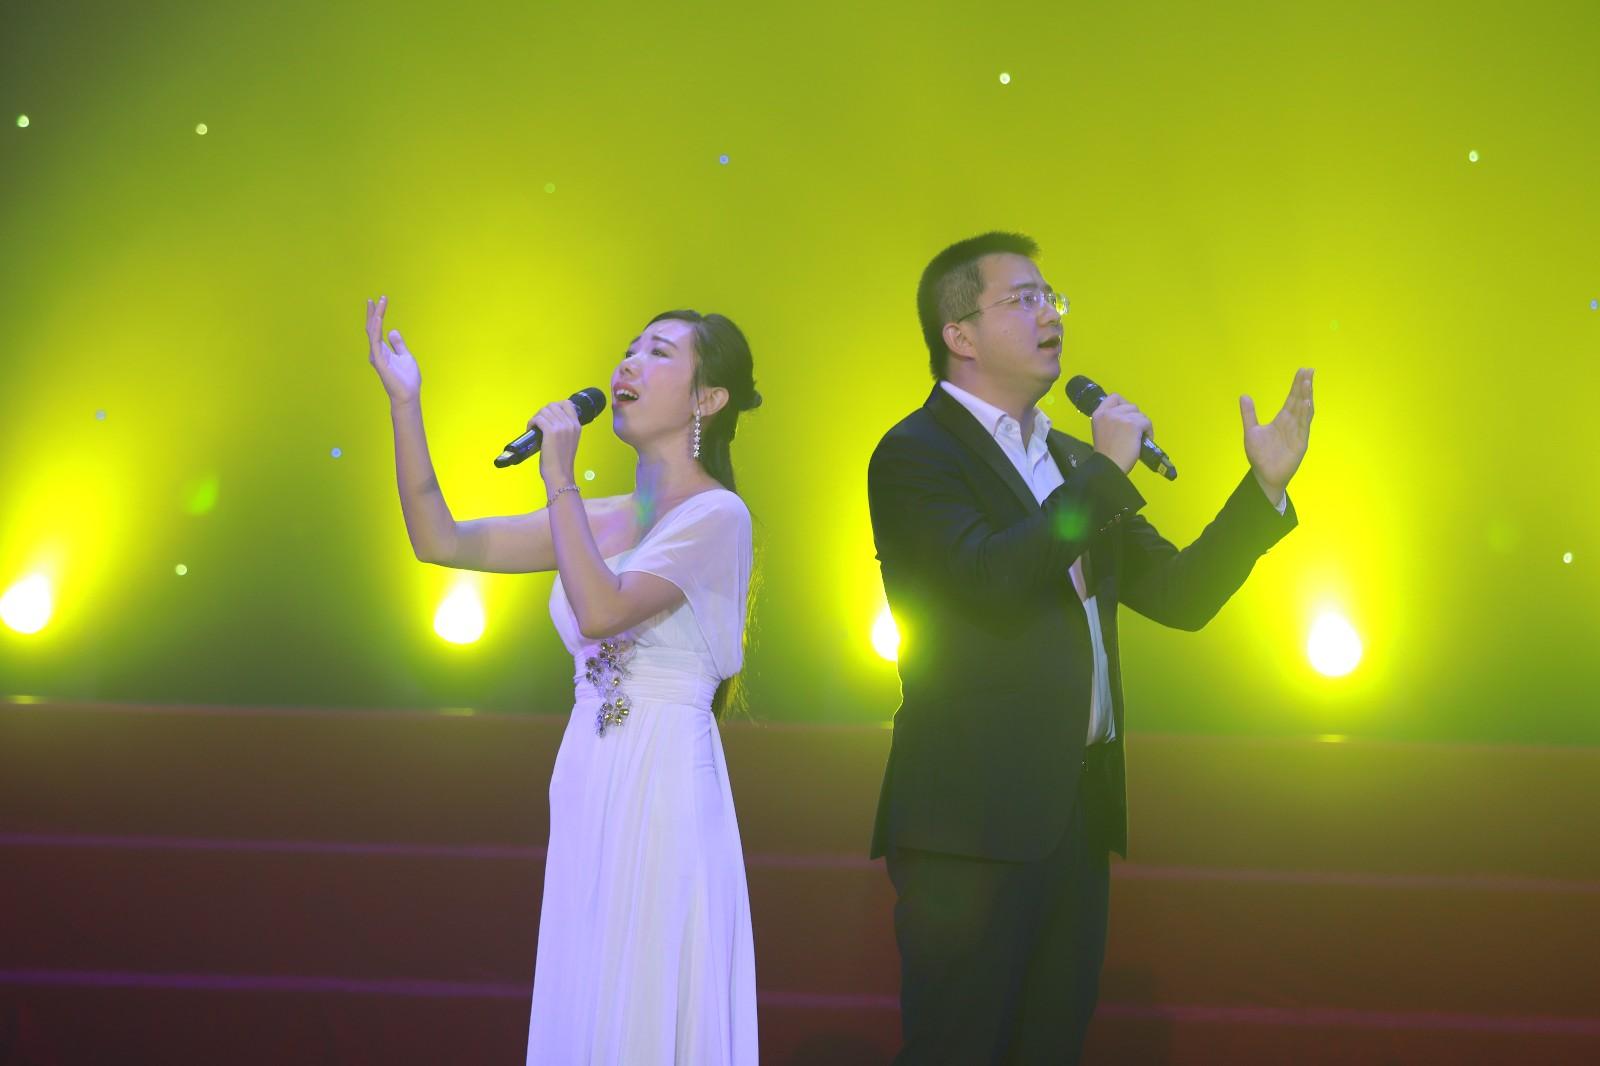 B4  胡阳春、李粤君老师代表三水中学参加2018年三水区教育系统教职工歌唱比赛,以一曲合唱《贝加尔湖畔》荣获金奖.jpg